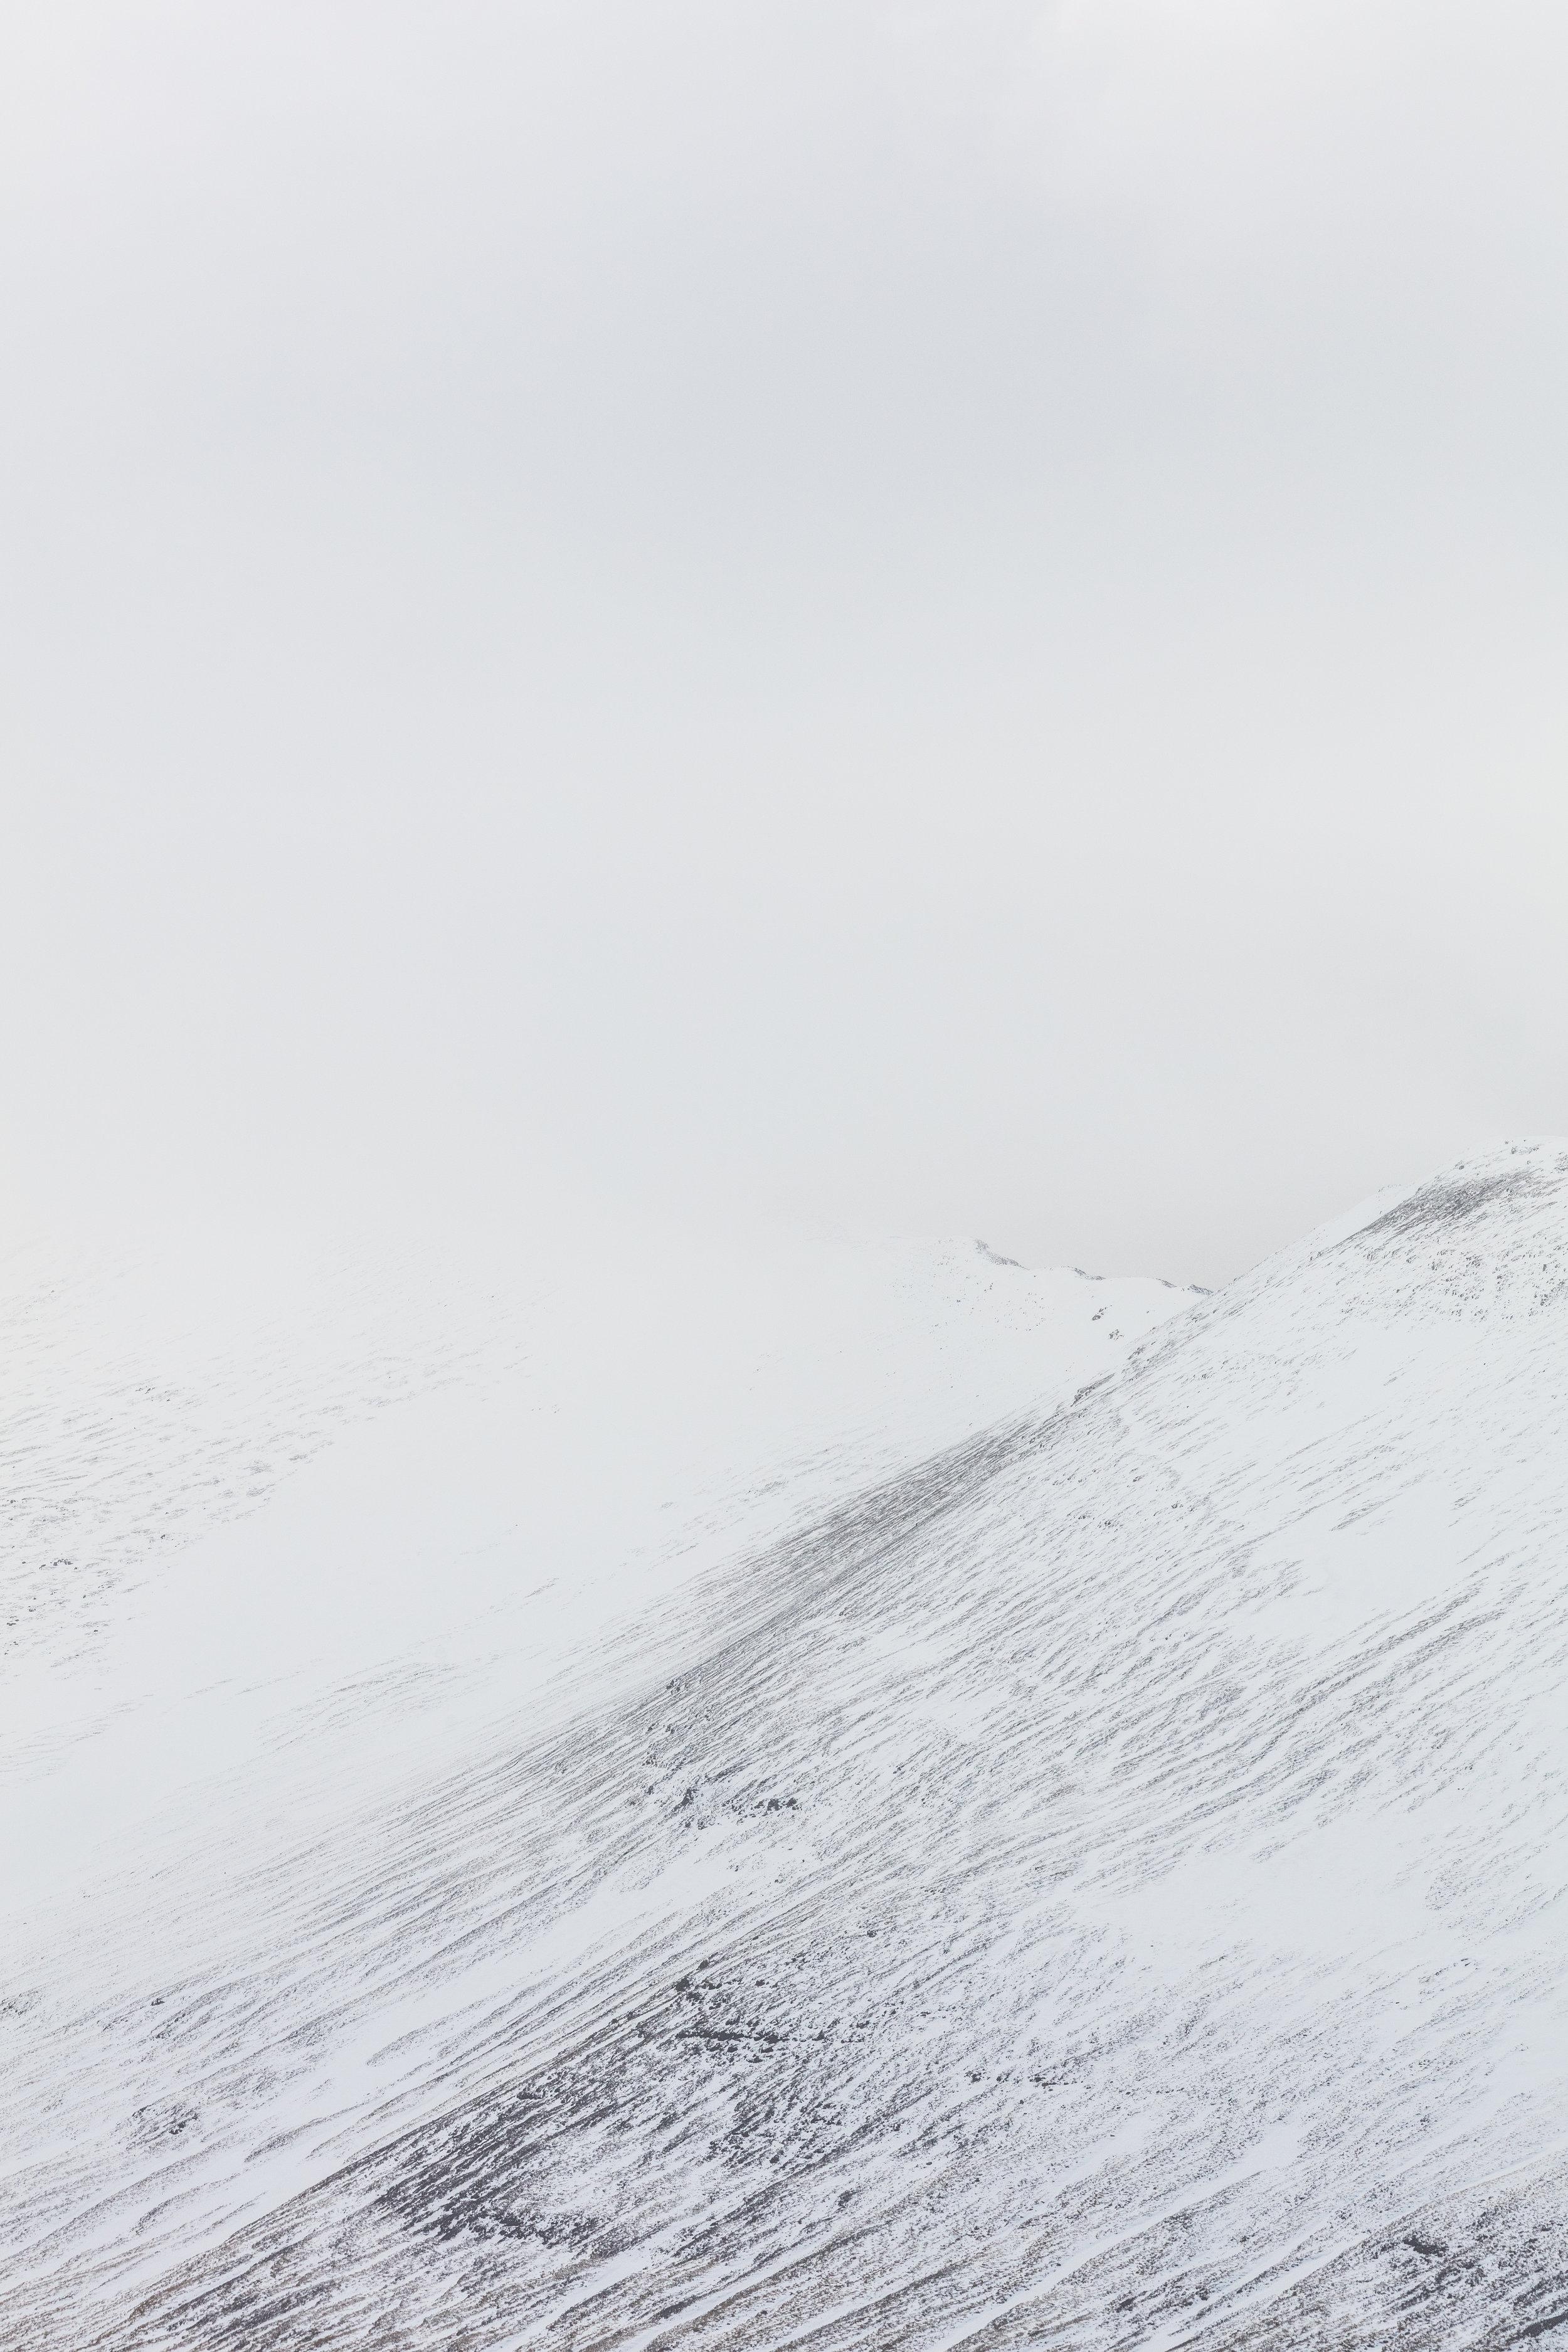 Snow Capped Mountain Peaks | The Fox Plateau - Faune